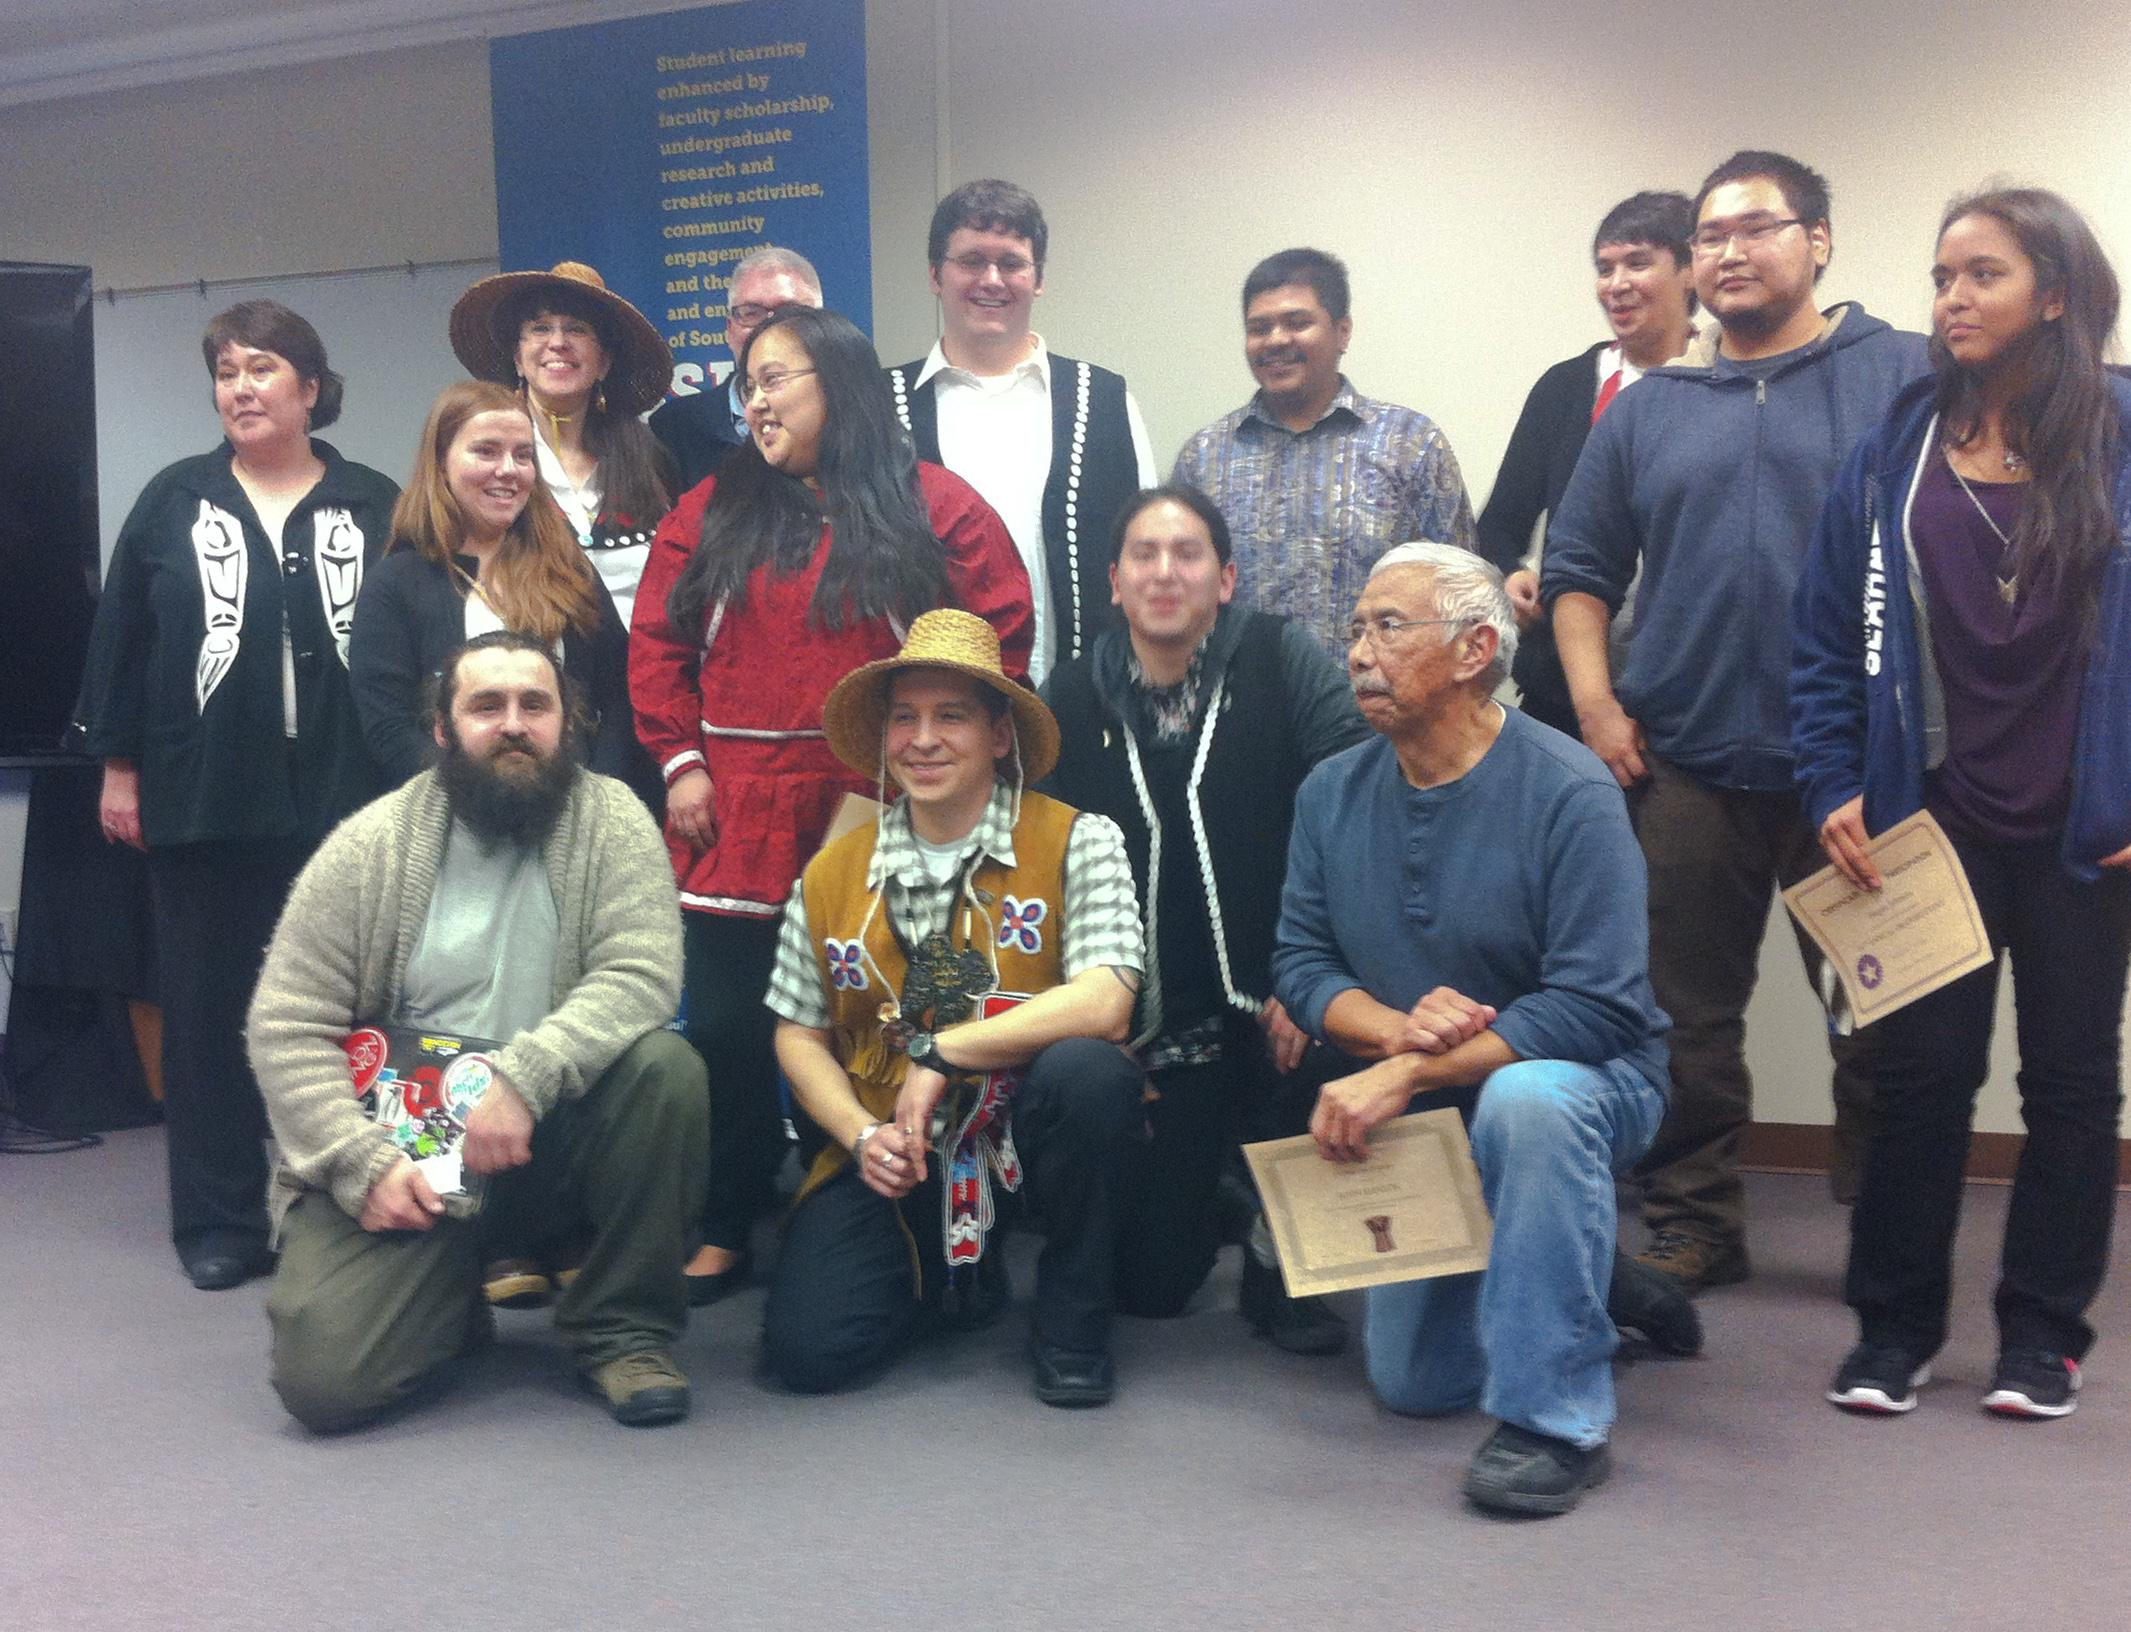 14th Annual Oratory Event participants